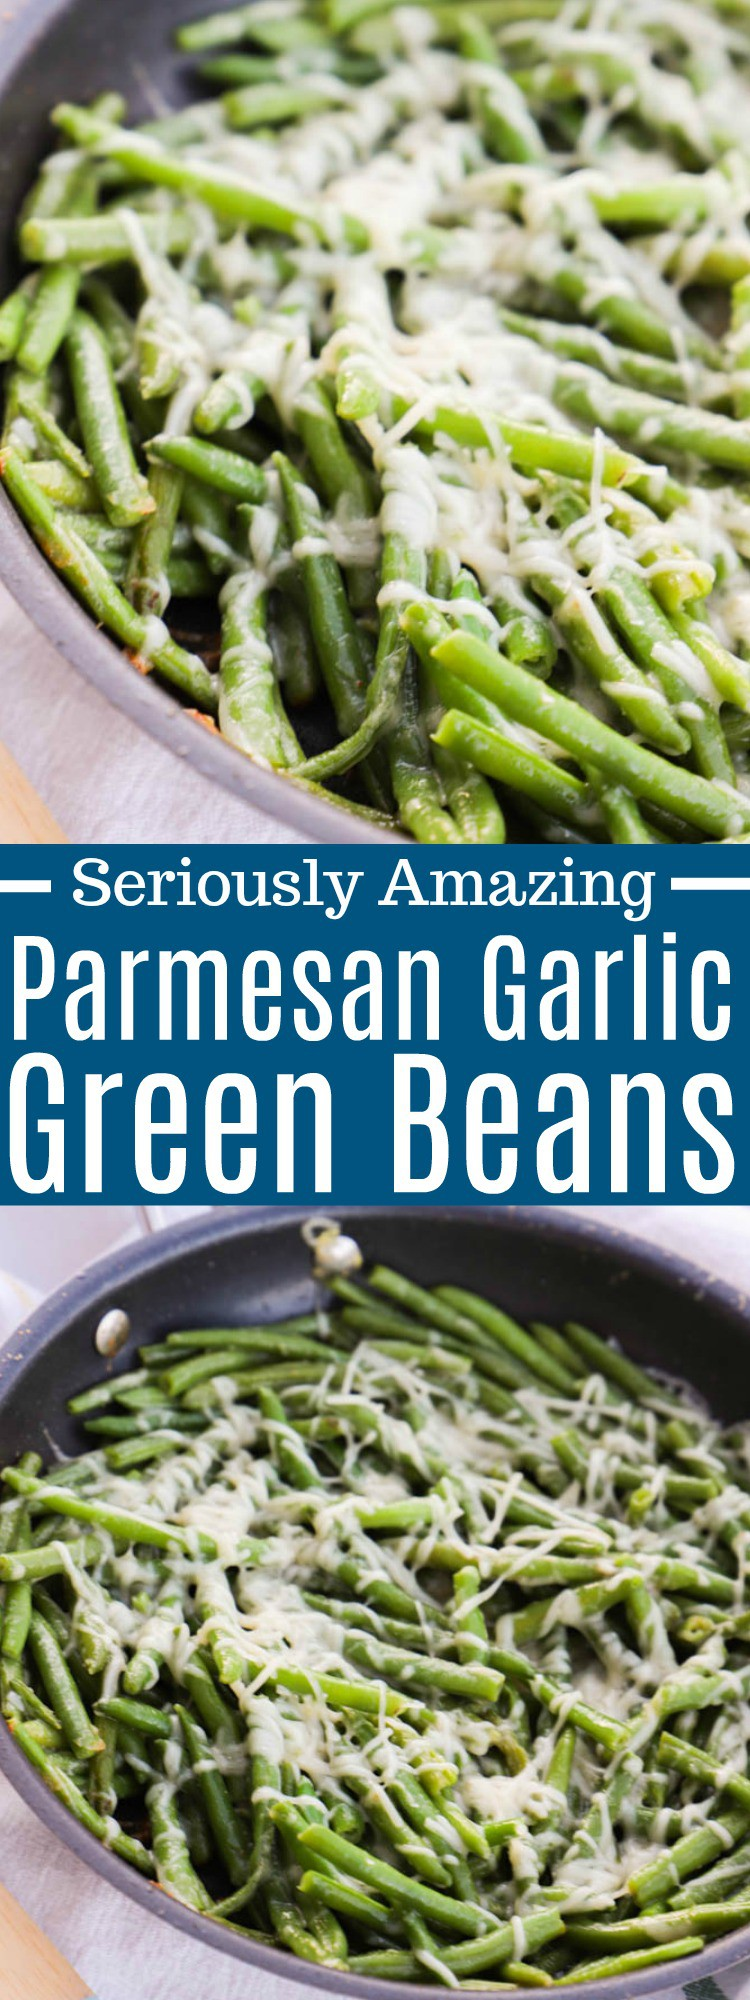 Parmesan Garlic Skillet Green Beans